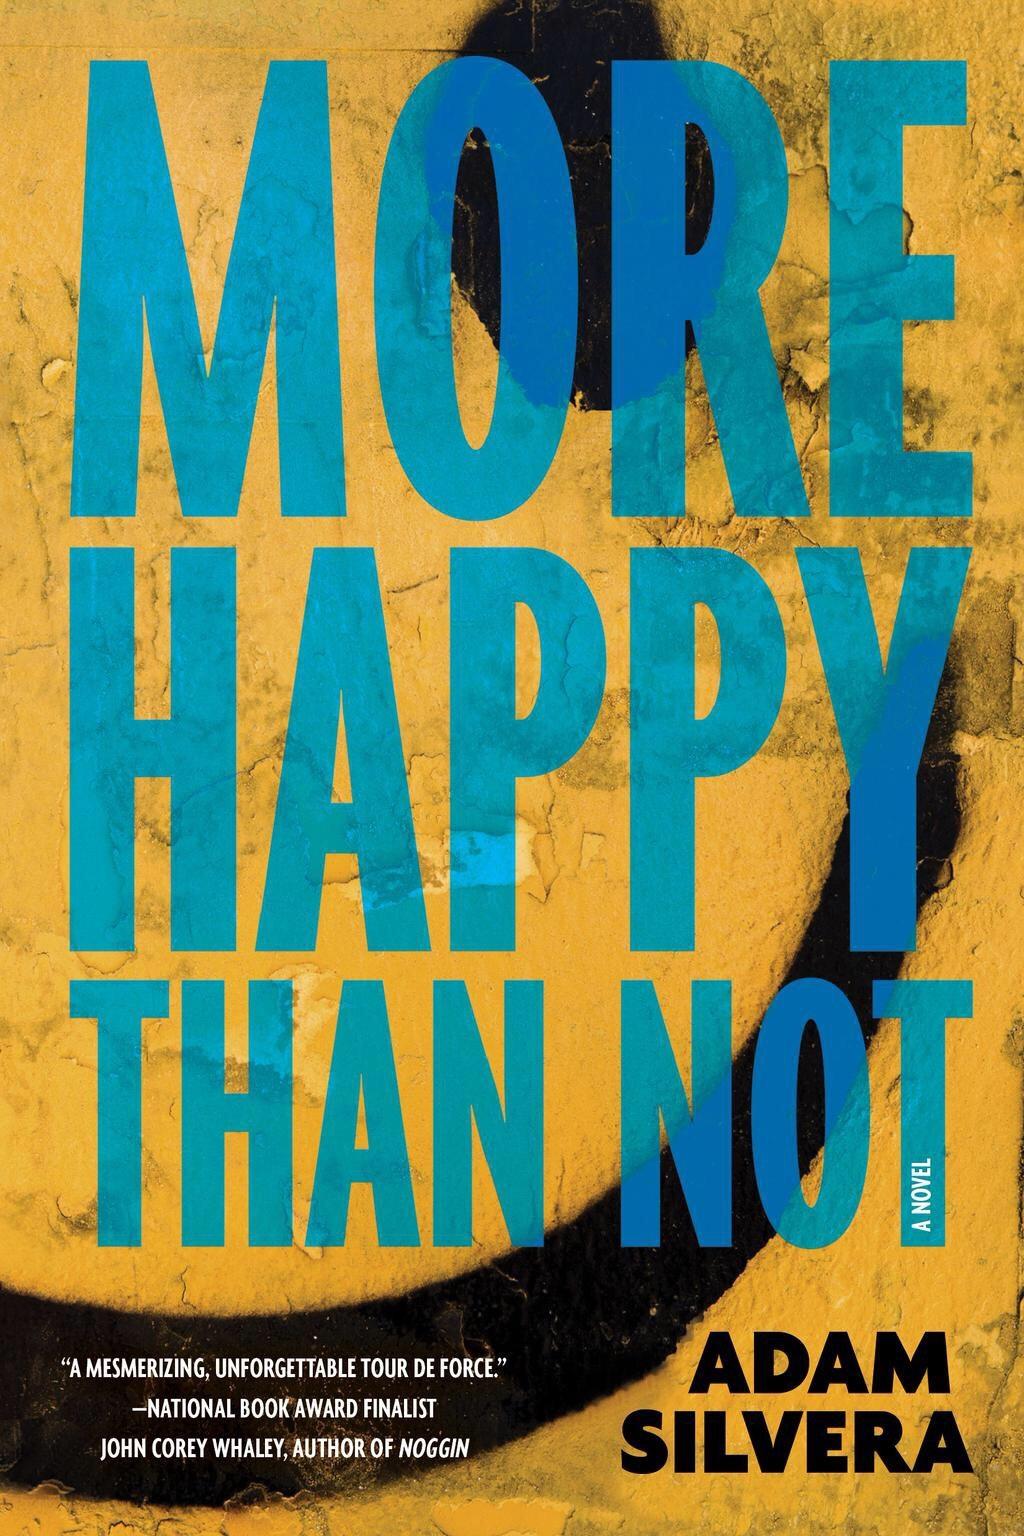 Adam Silvera - More Happy Than Not